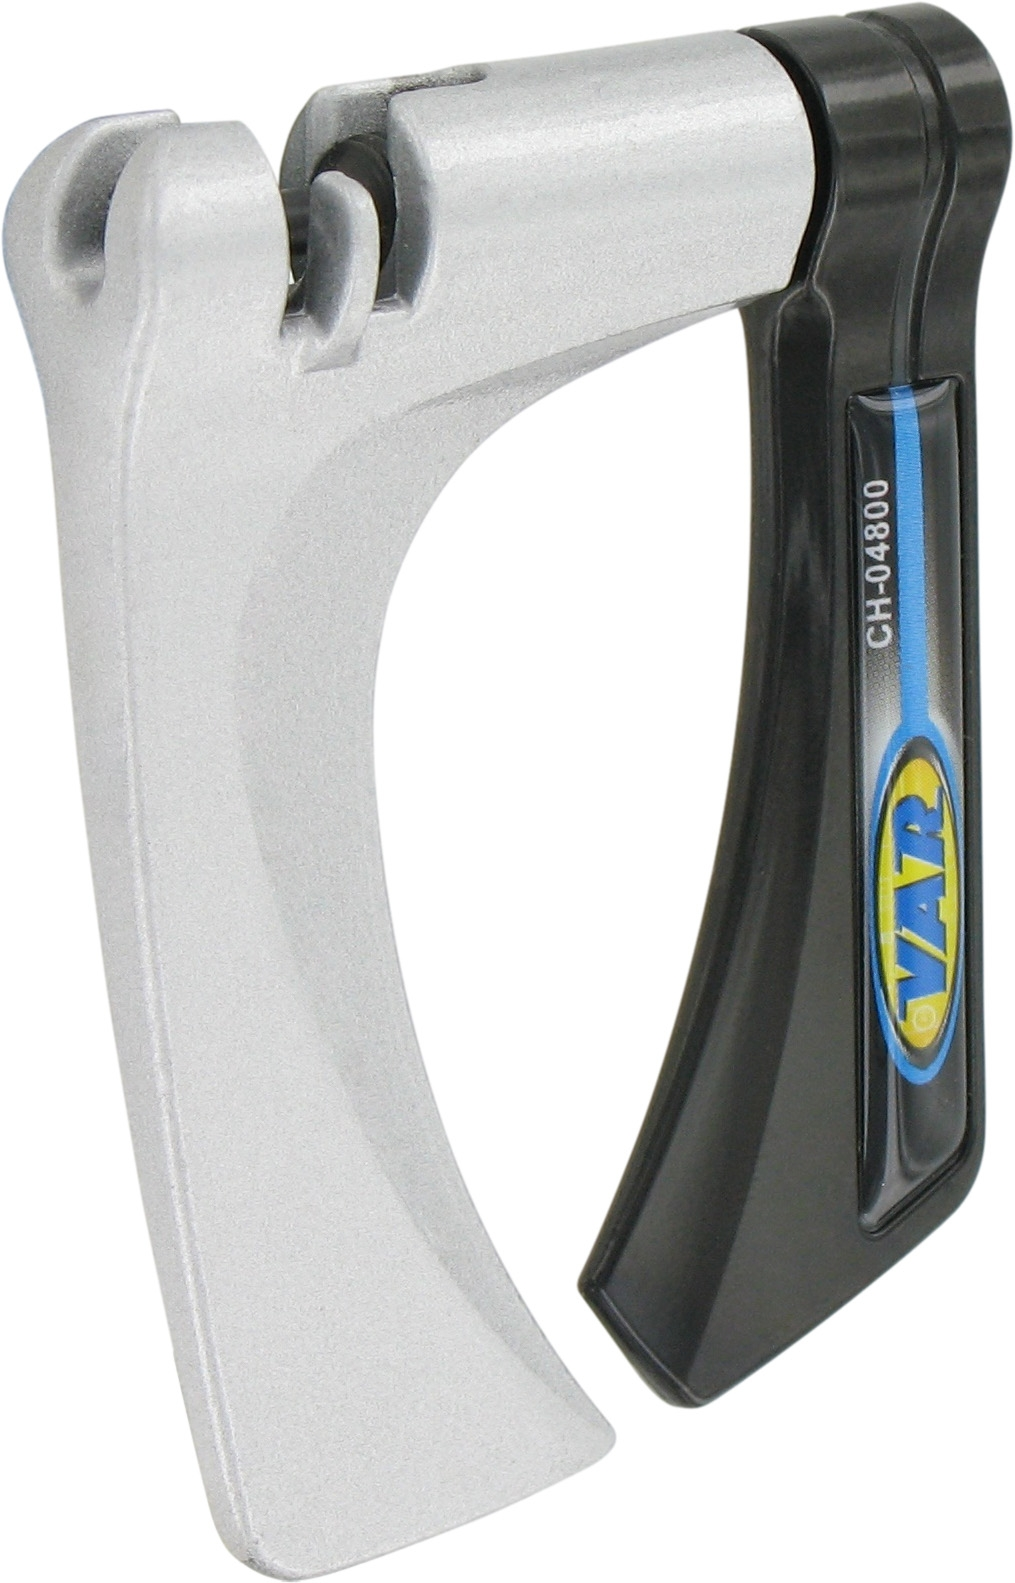 Dérive-chaîne VAR Compact 8/9/10/11 vitesses